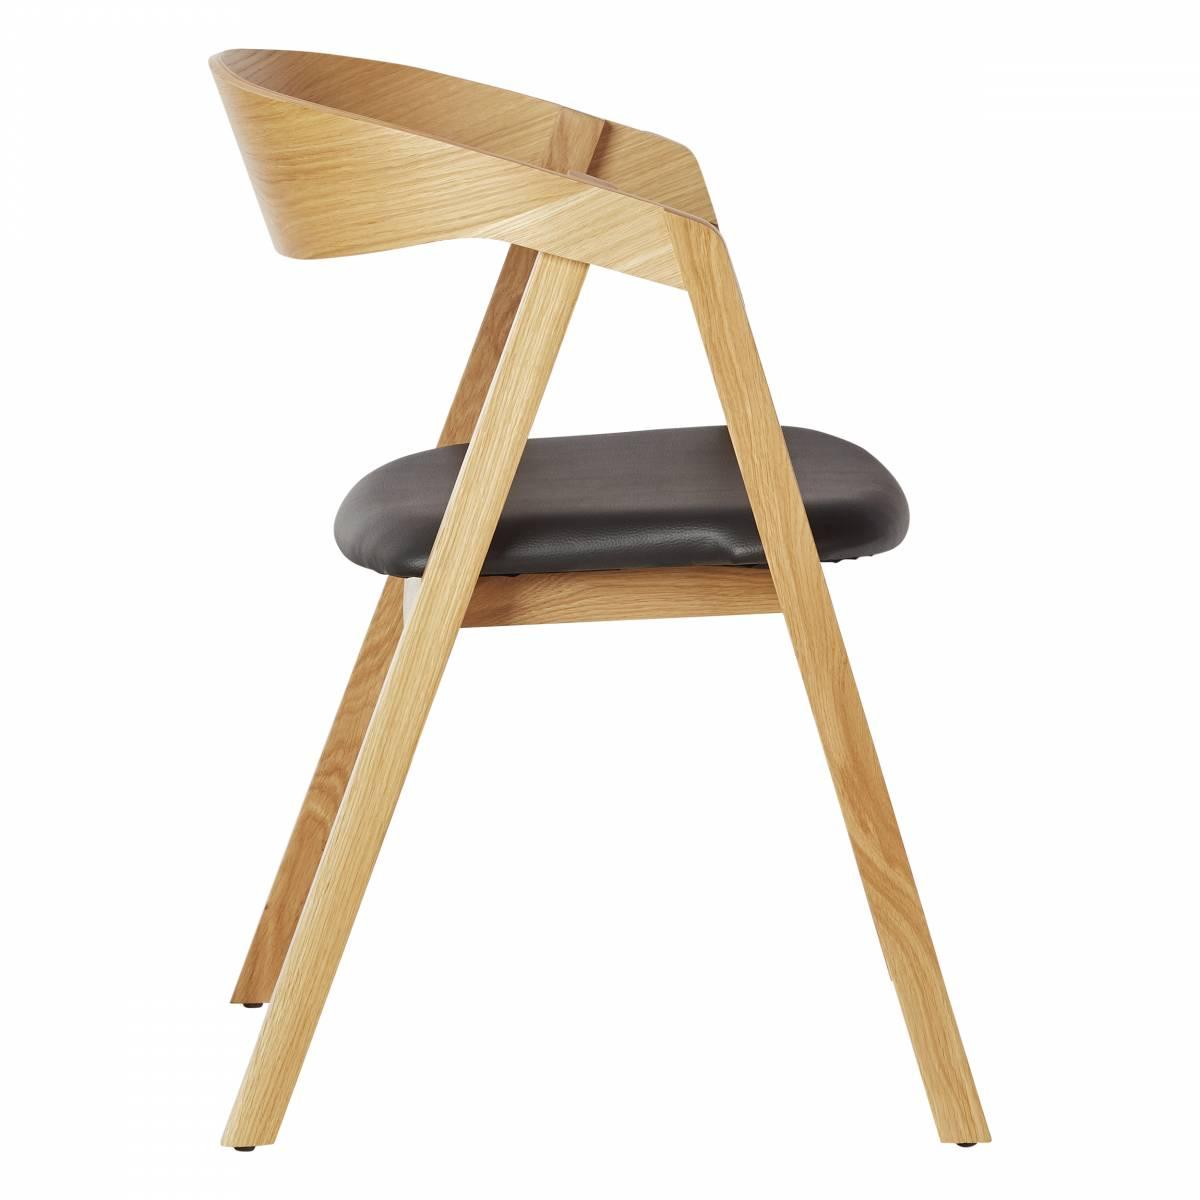 Indoor Furniture Scandinavian Design Georgia Ps Restaurant Chair With Upholstered Seat